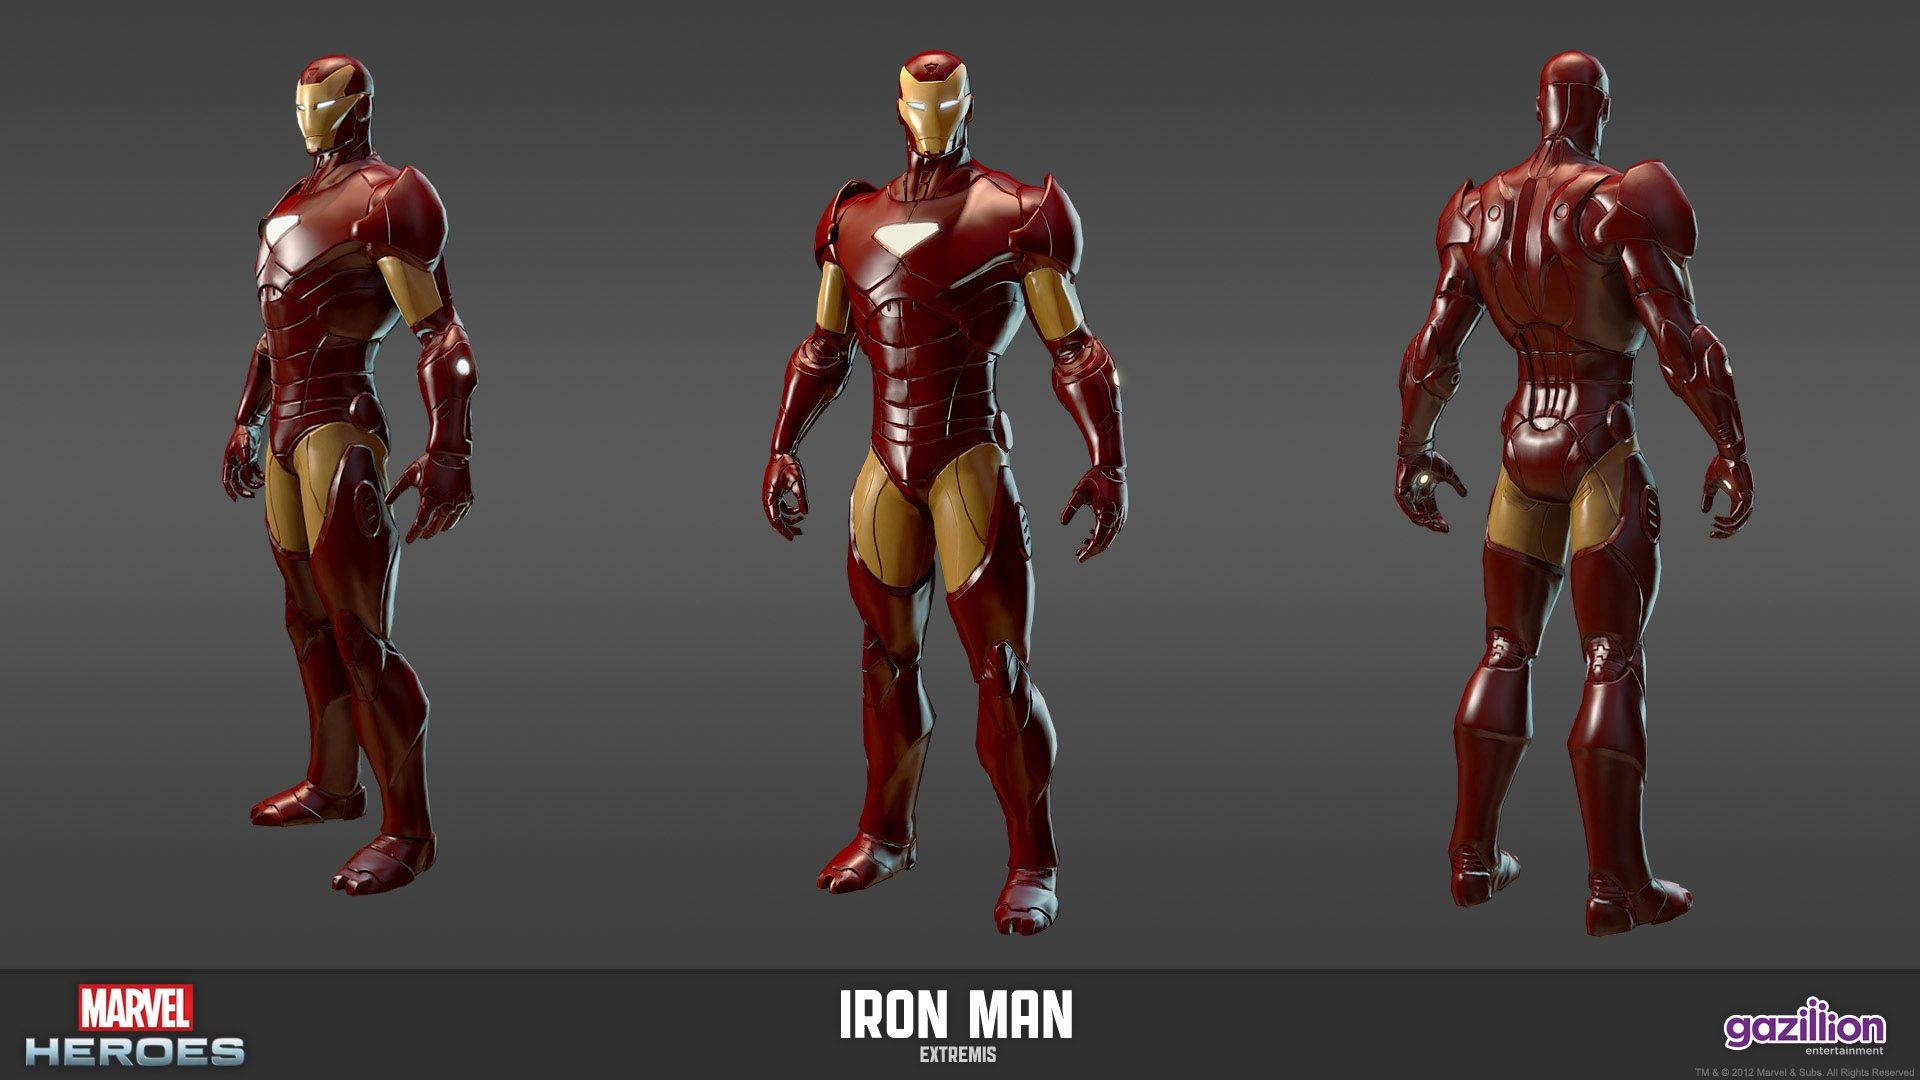 Marvel Heroes Iron Man Extremis Marvel Heroes Iron Man Marvel Heroes Game